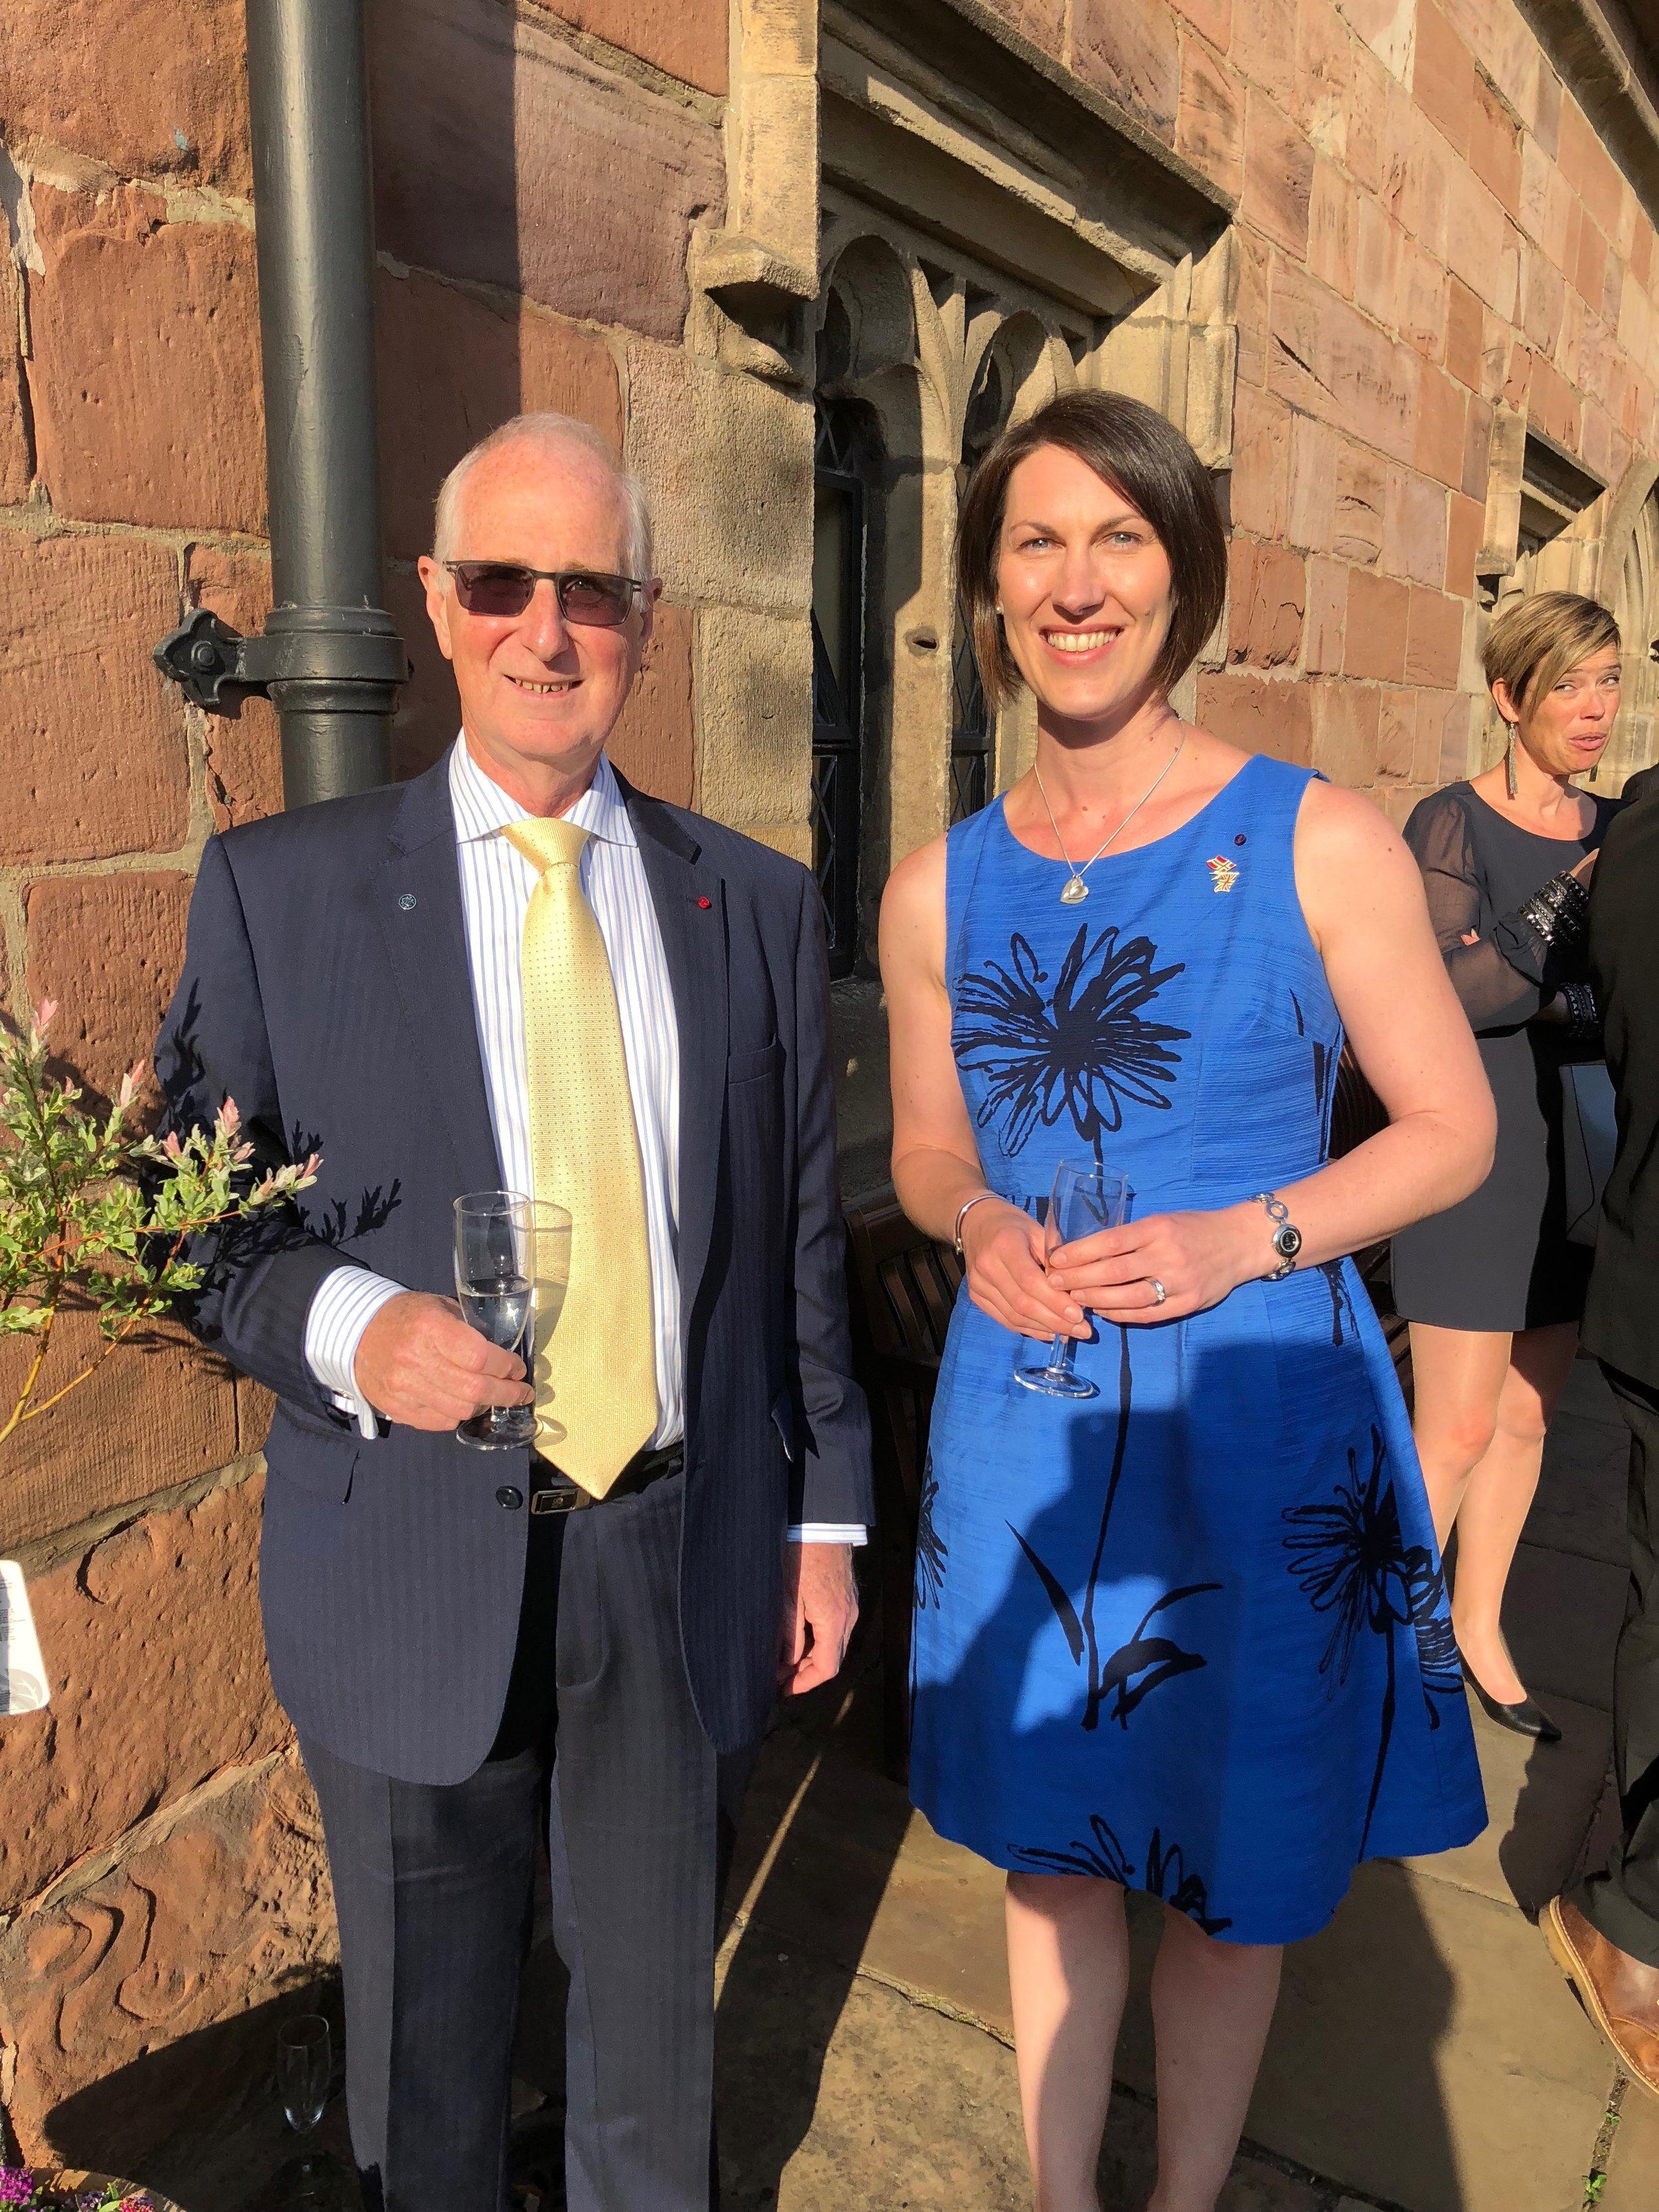 Alexandra Stewart Honorary Consul of Norway and Chris Rostron Honorary Consul of Finland and the President of the MCA